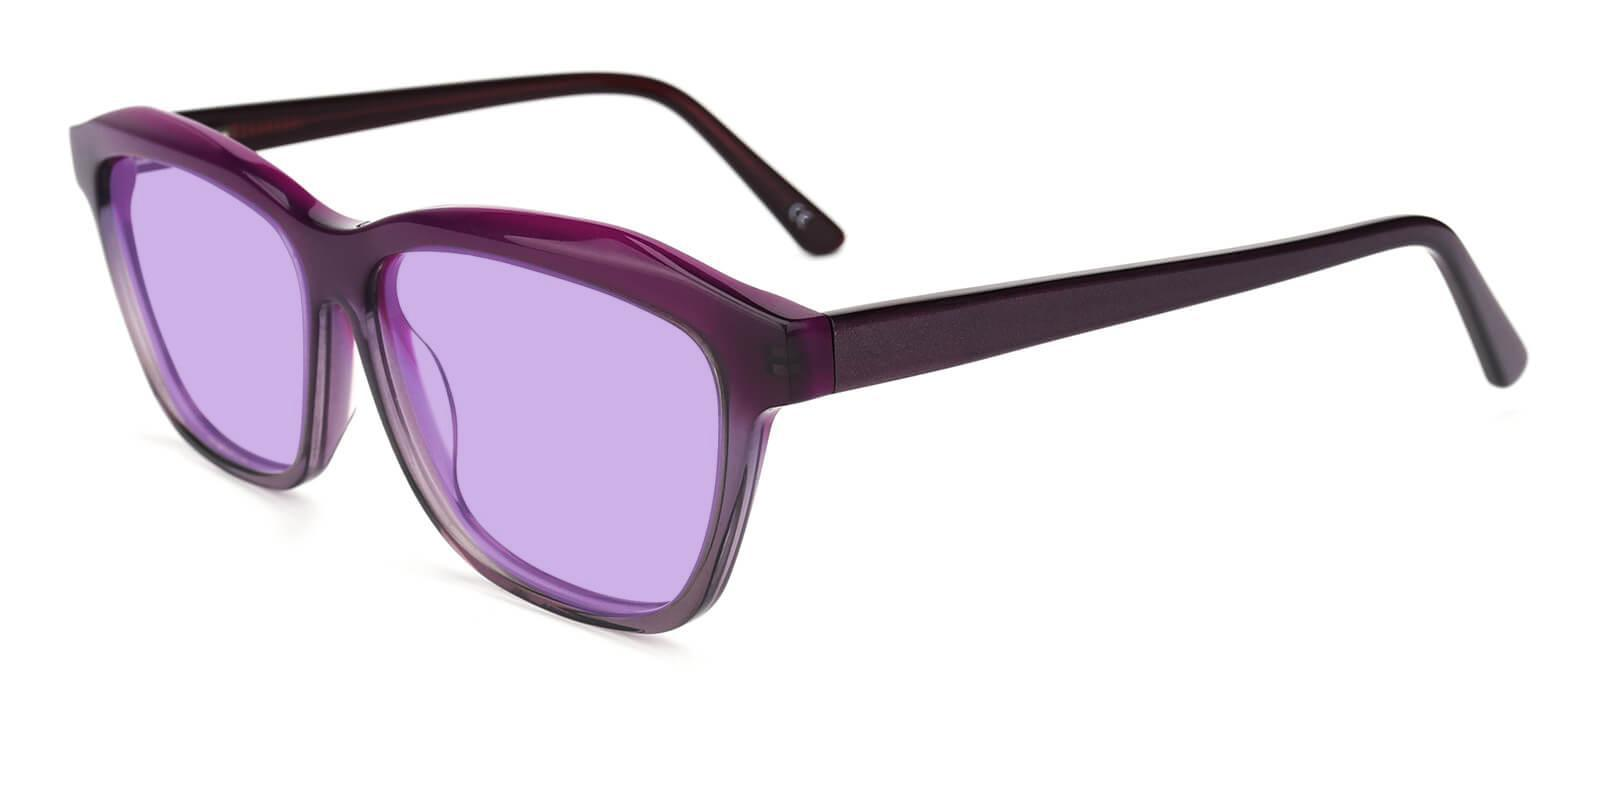 Morning Purple Acetate SpringHinges , Sunglasses , UniversalBridgeFit Frames from ABBE Glasses